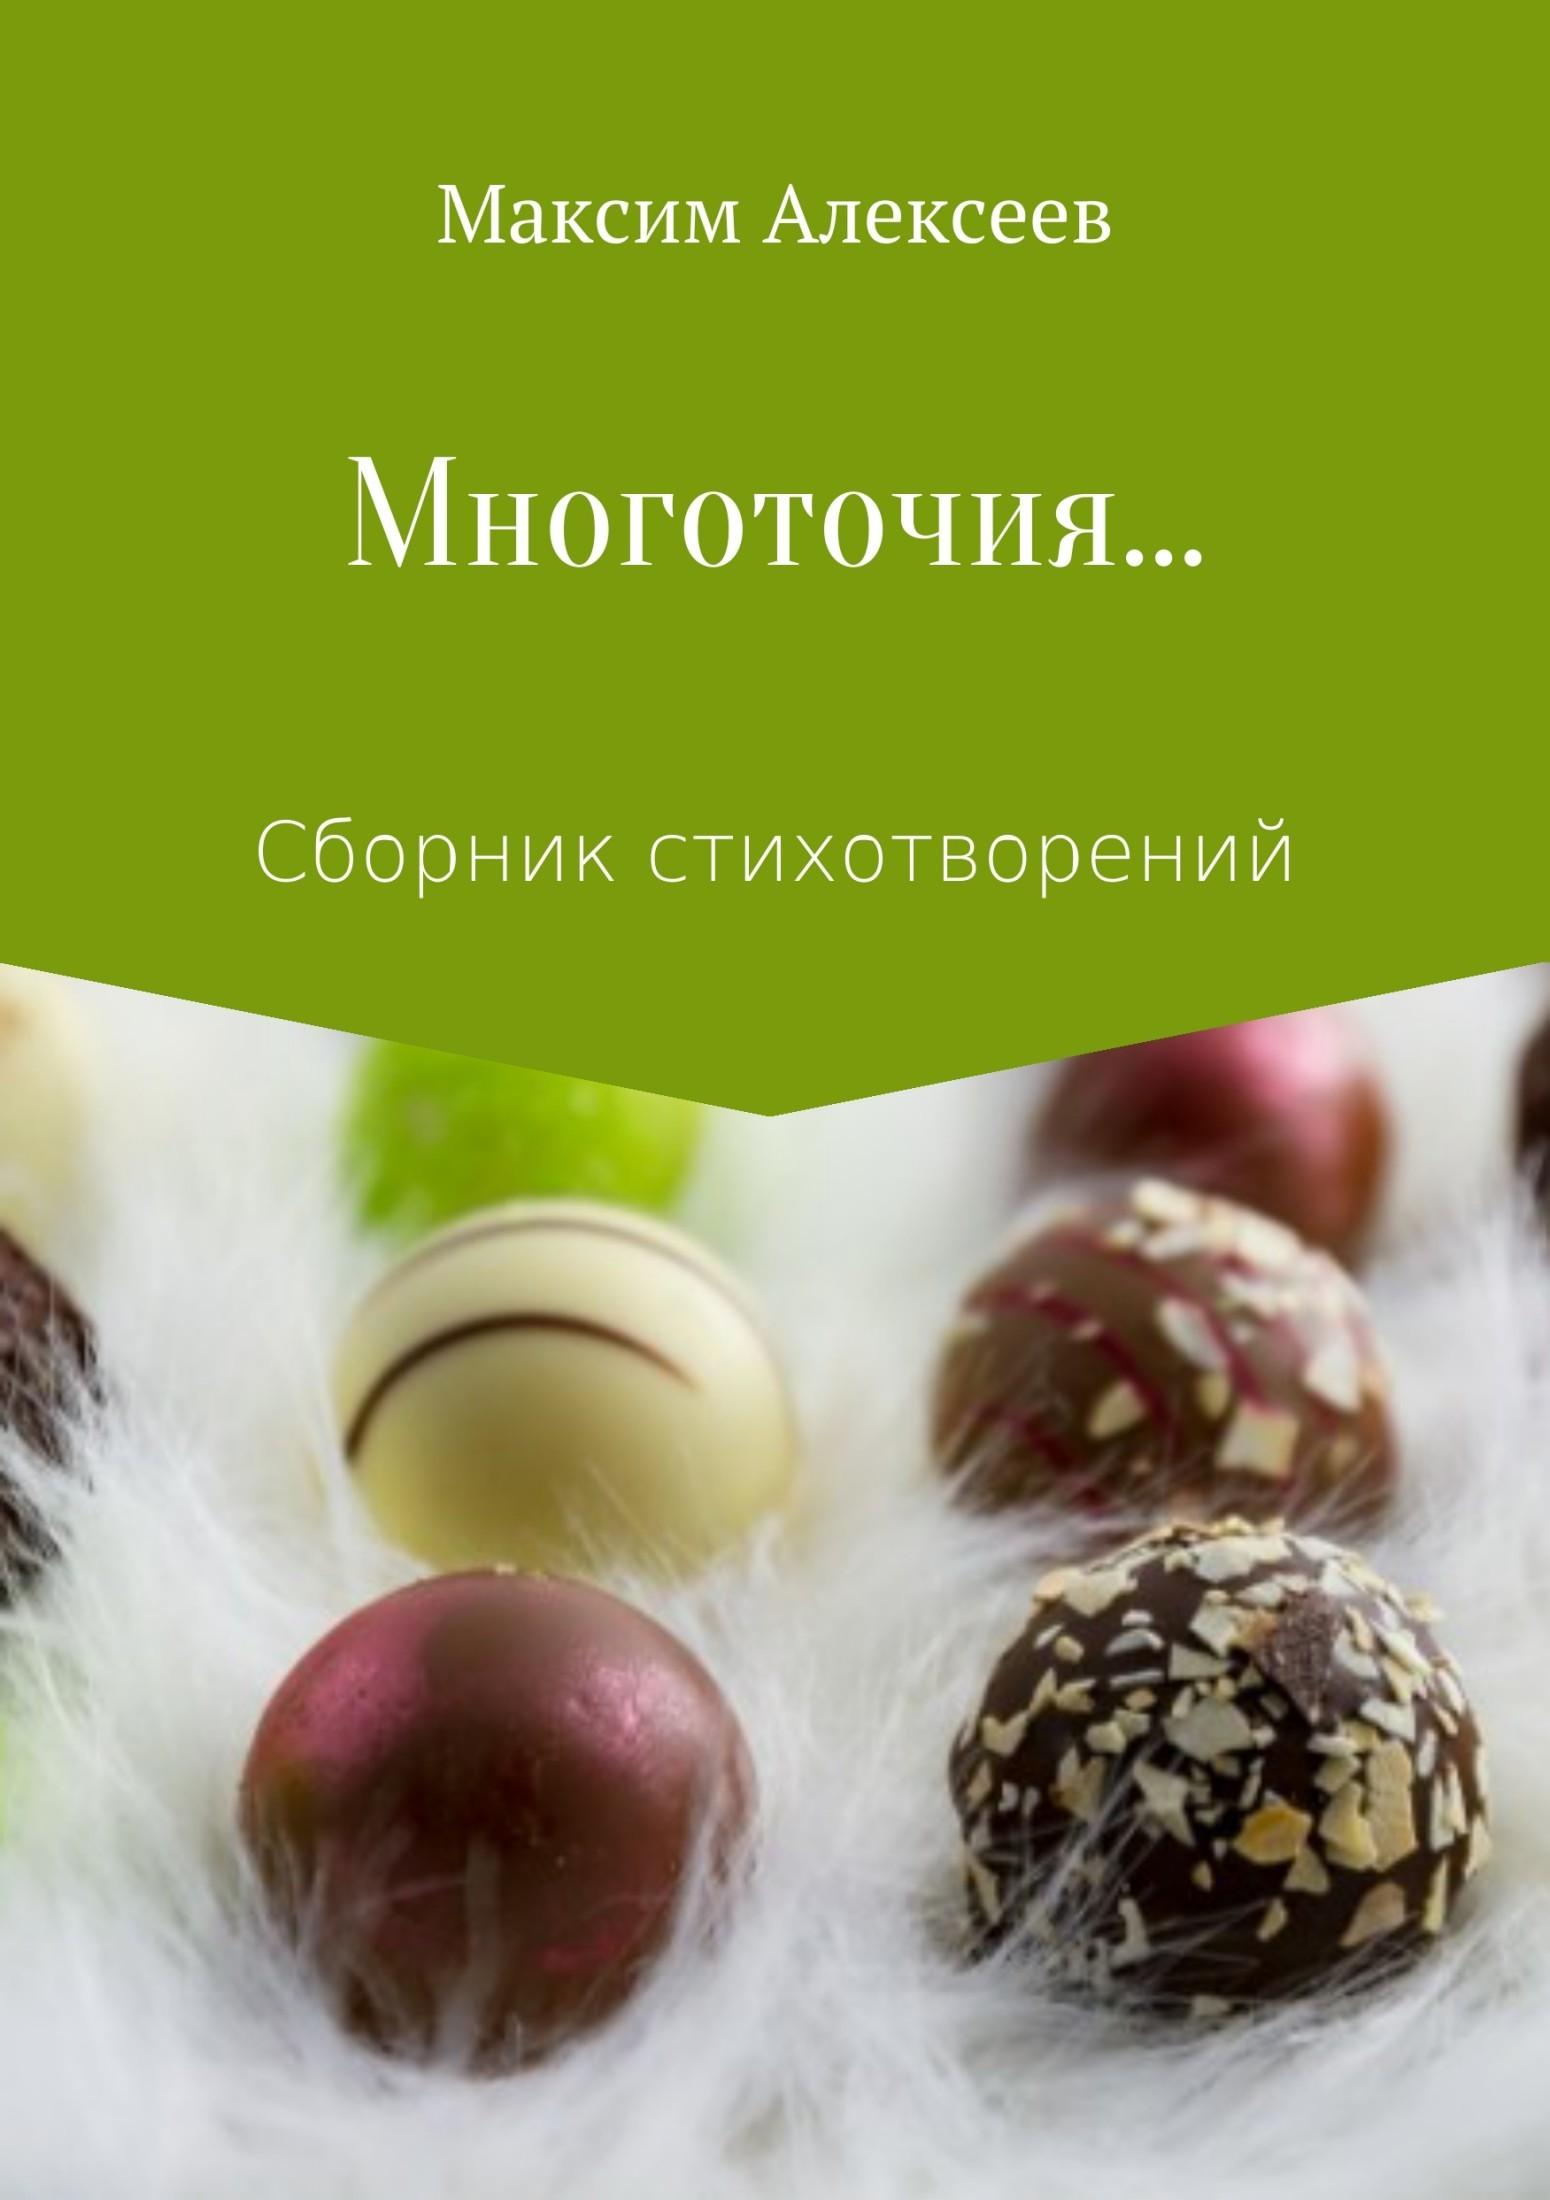 Максим Алексеев - Многоточия… Сборник стихотворений